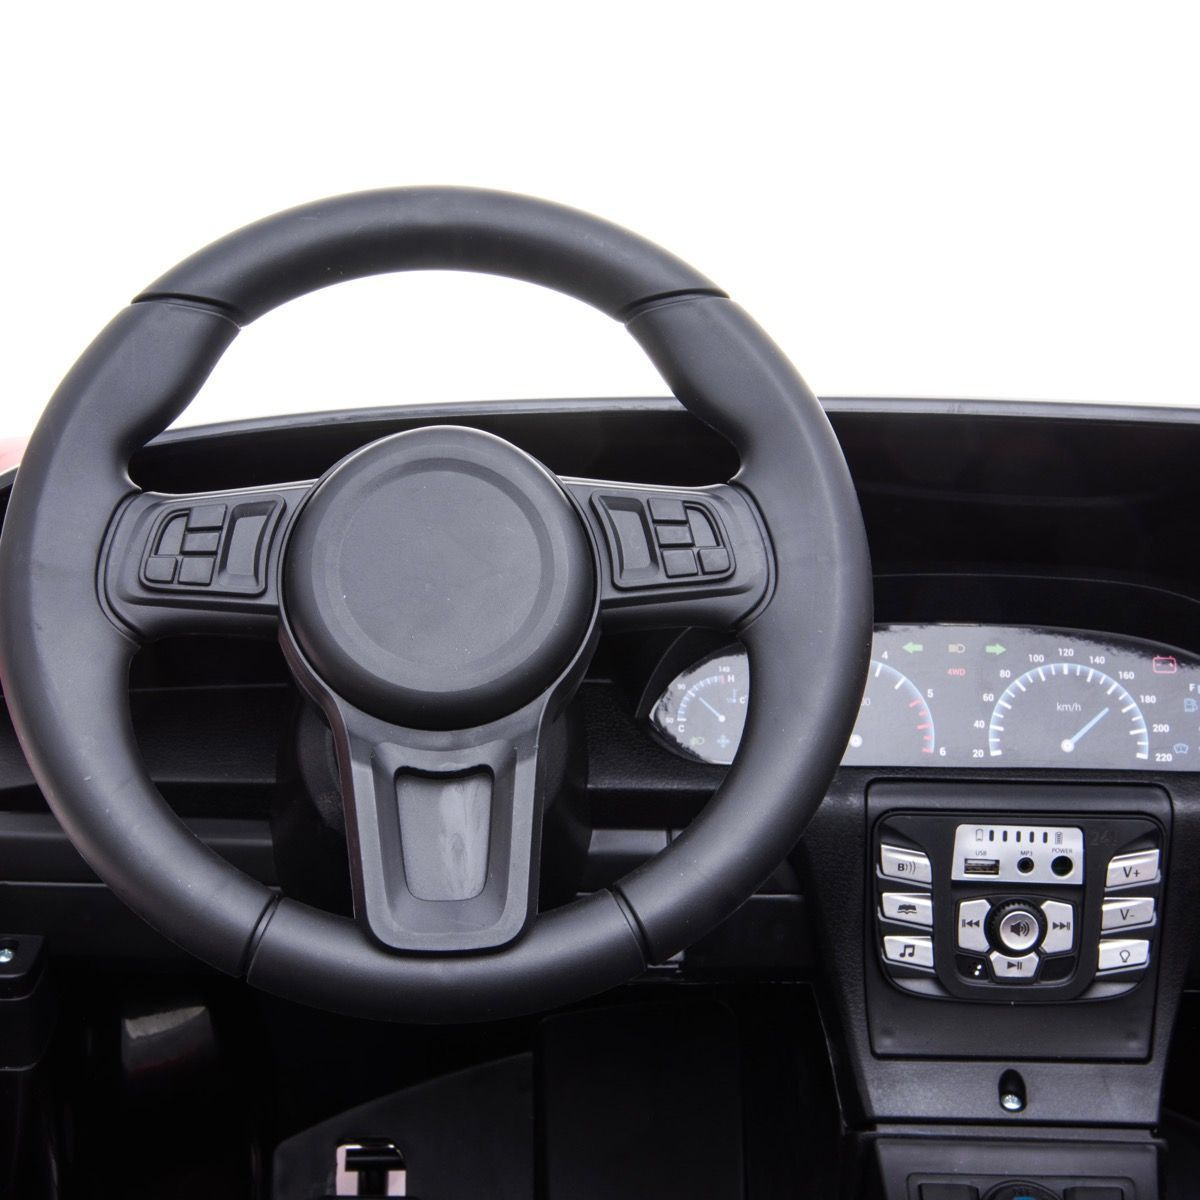 Deportivo Pekecars XL 24V Rojo - volante